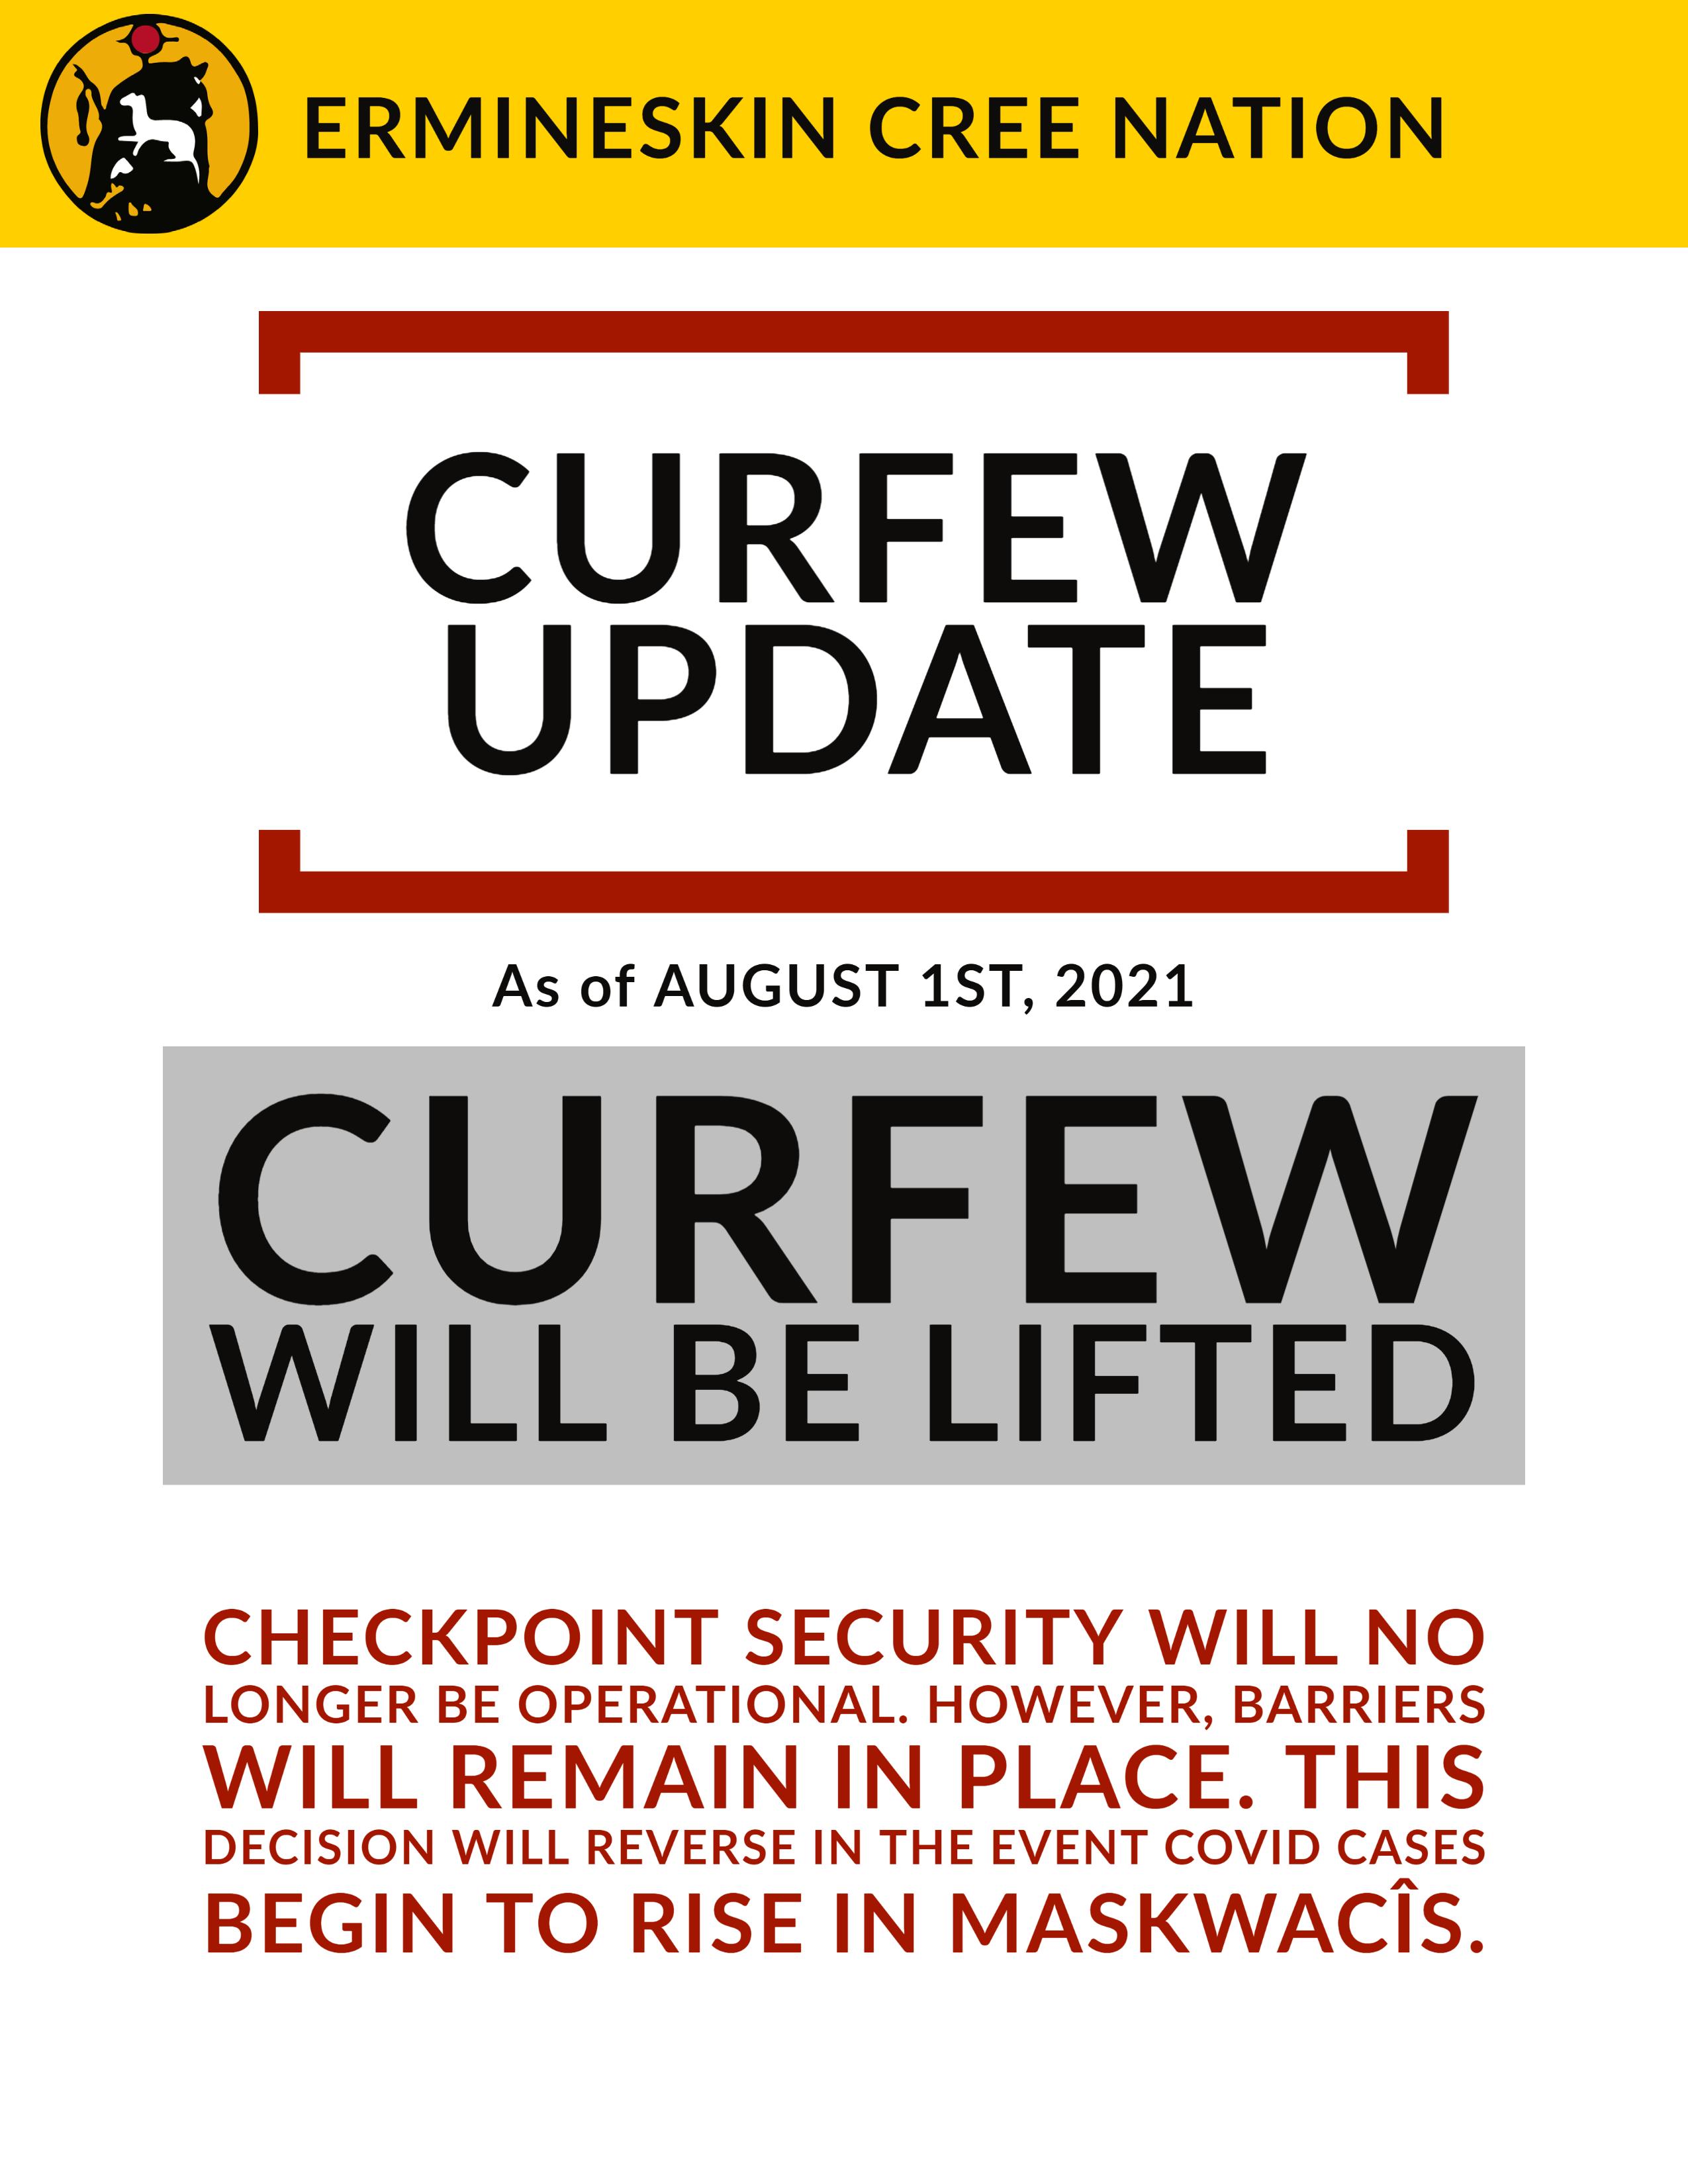 curfew up;date